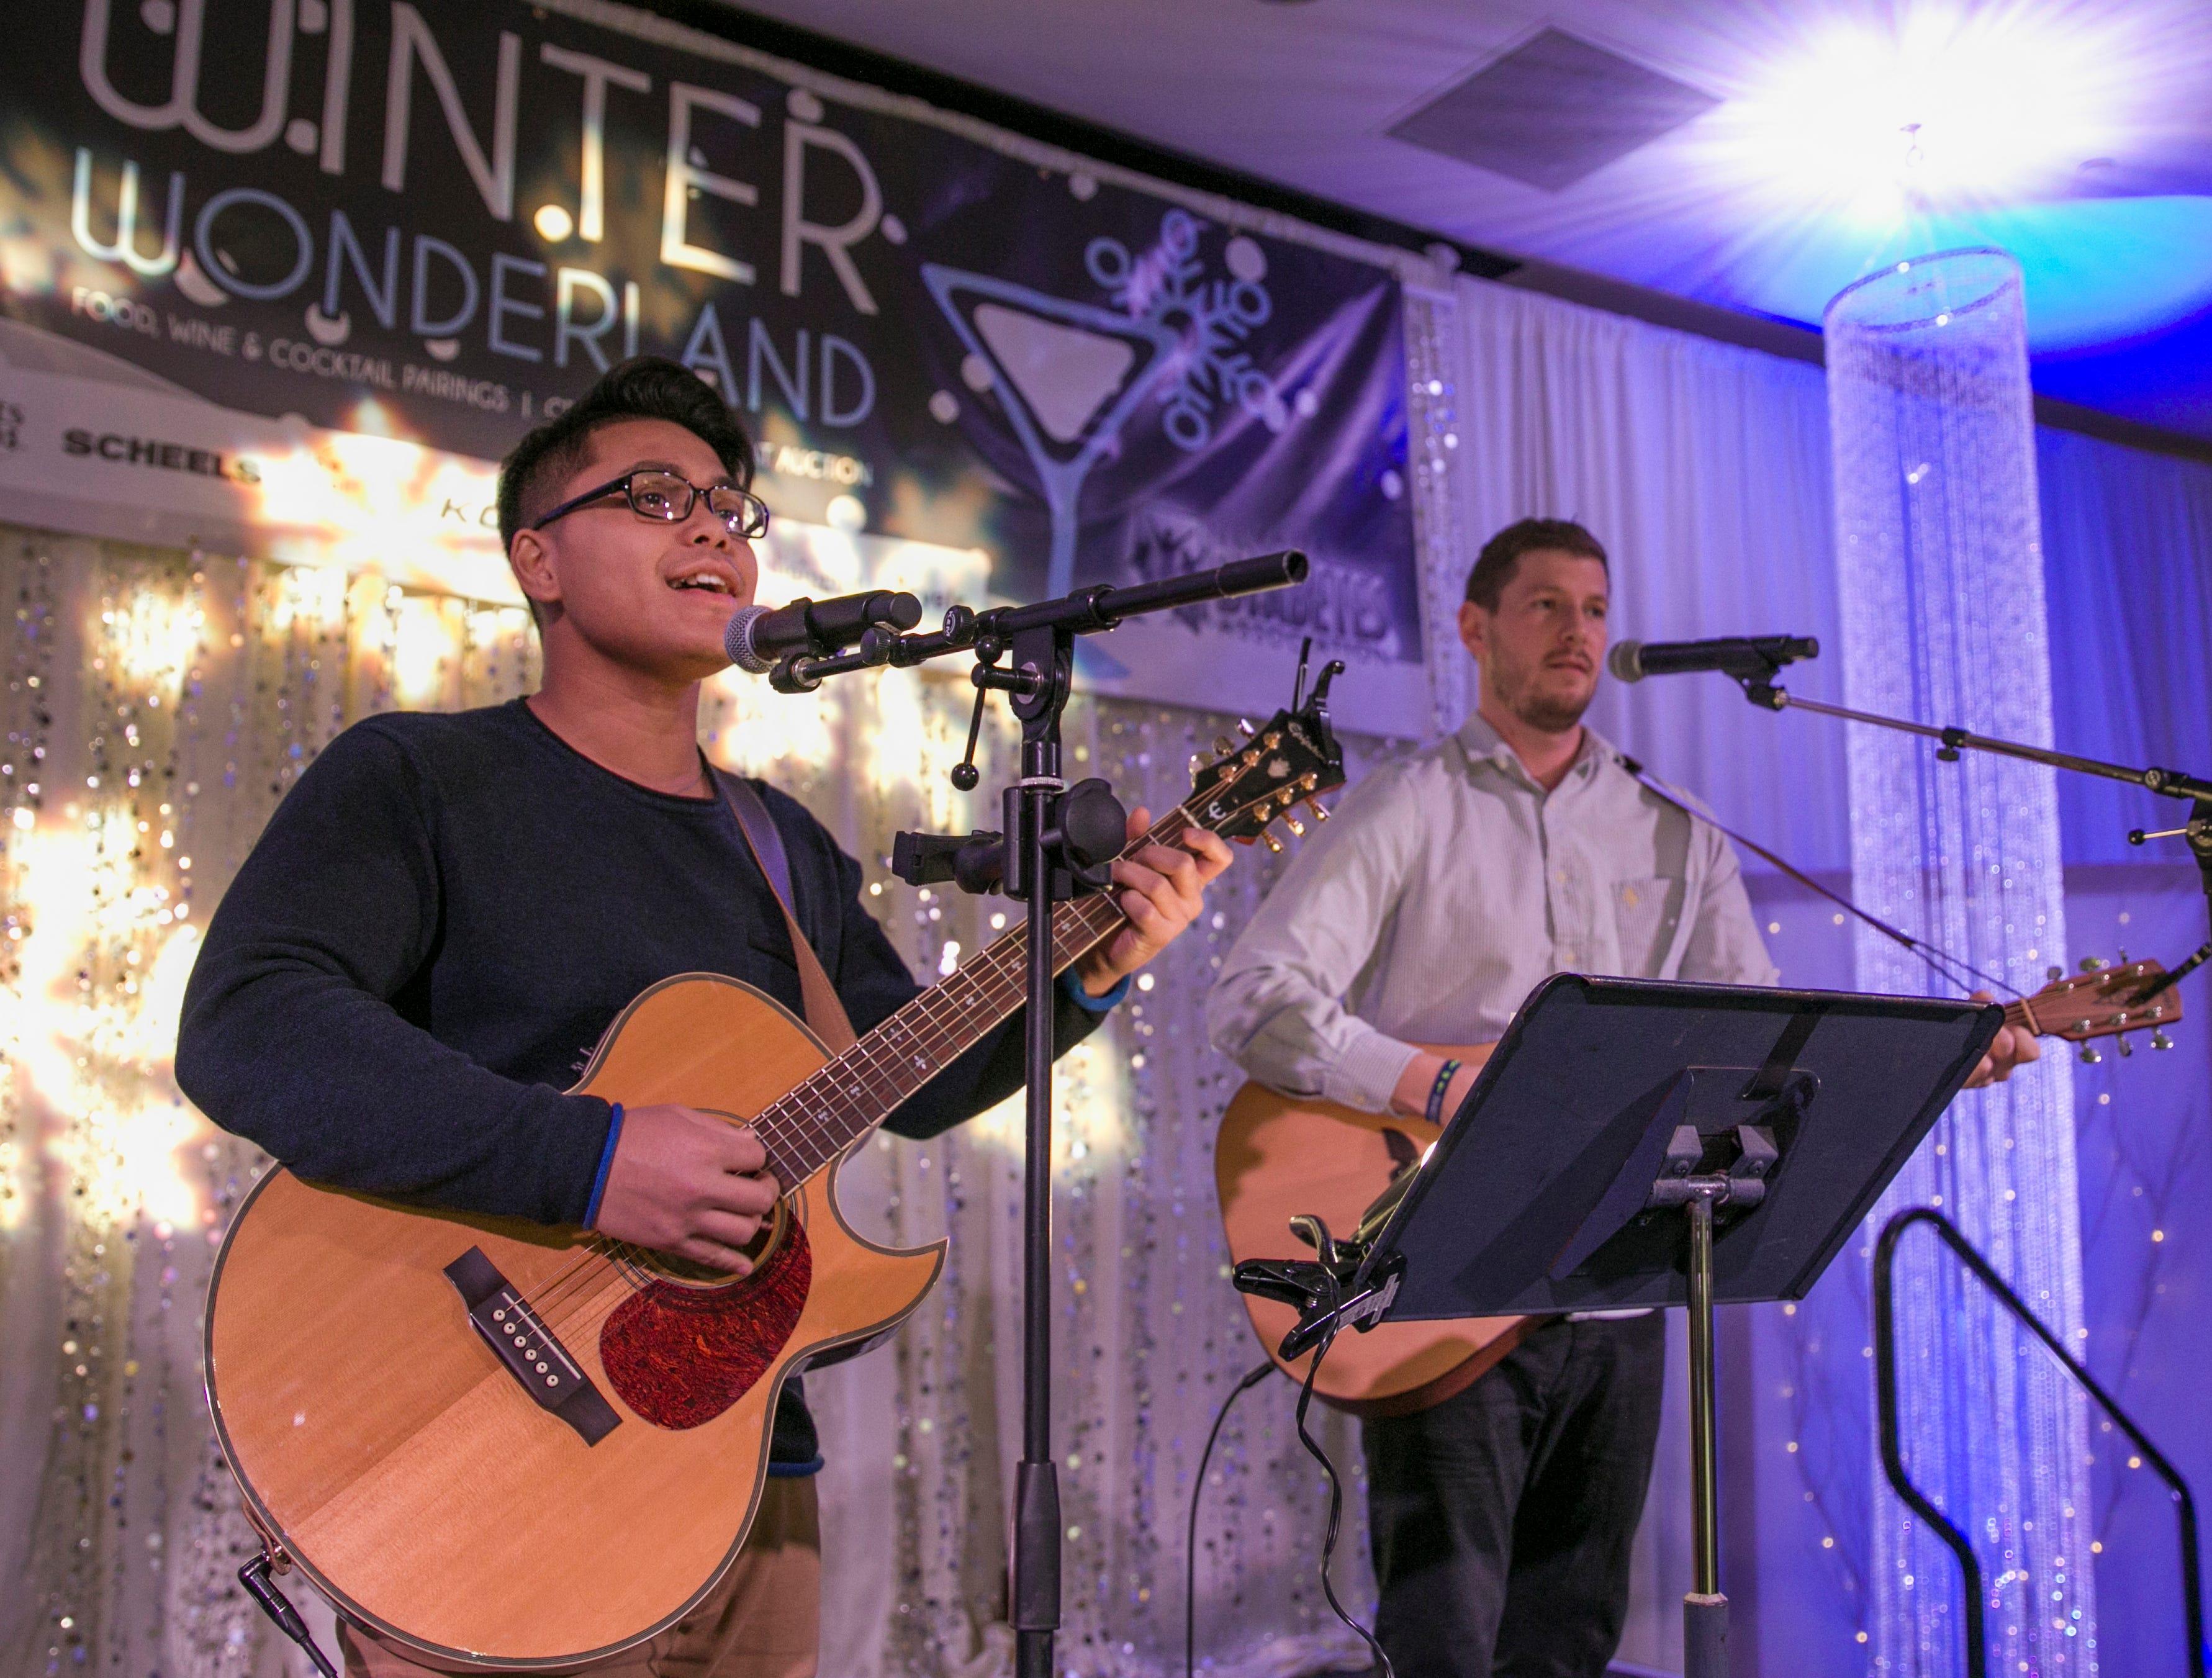 Photos from the Winter Wonderland on Thursday, Feb. 8